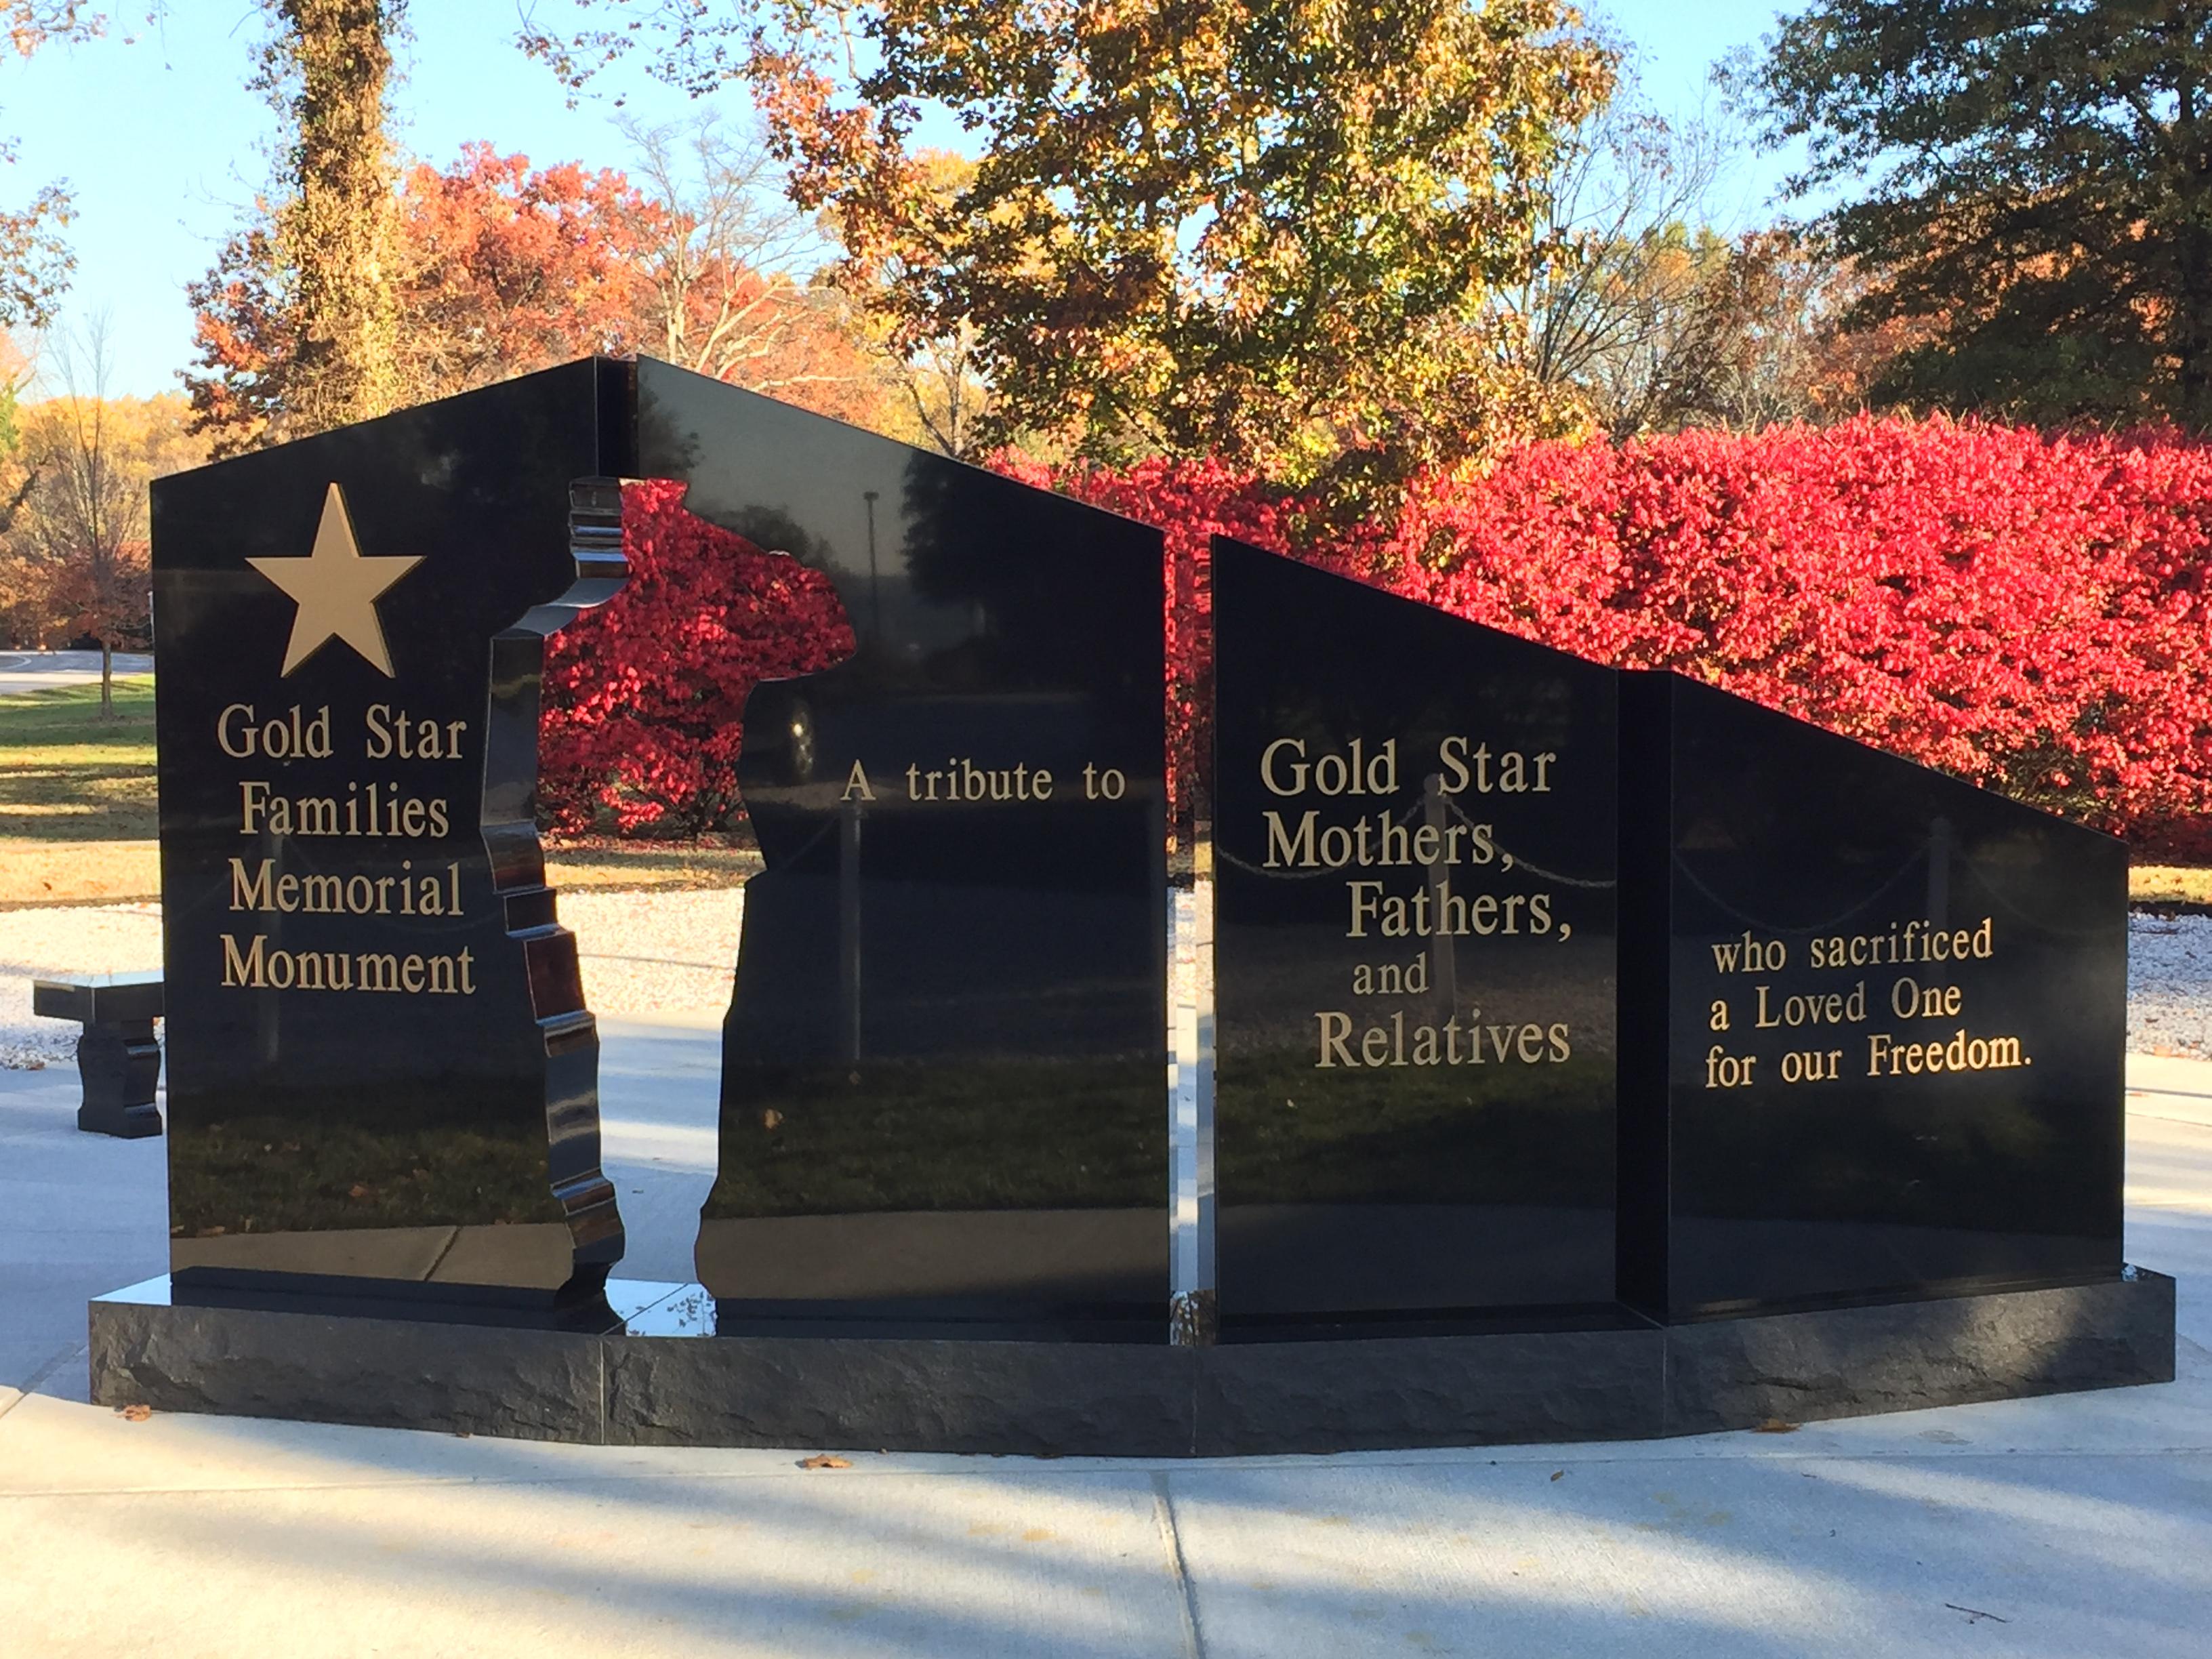 Cemetery and memorial program gold star families monument izmirmasajfo